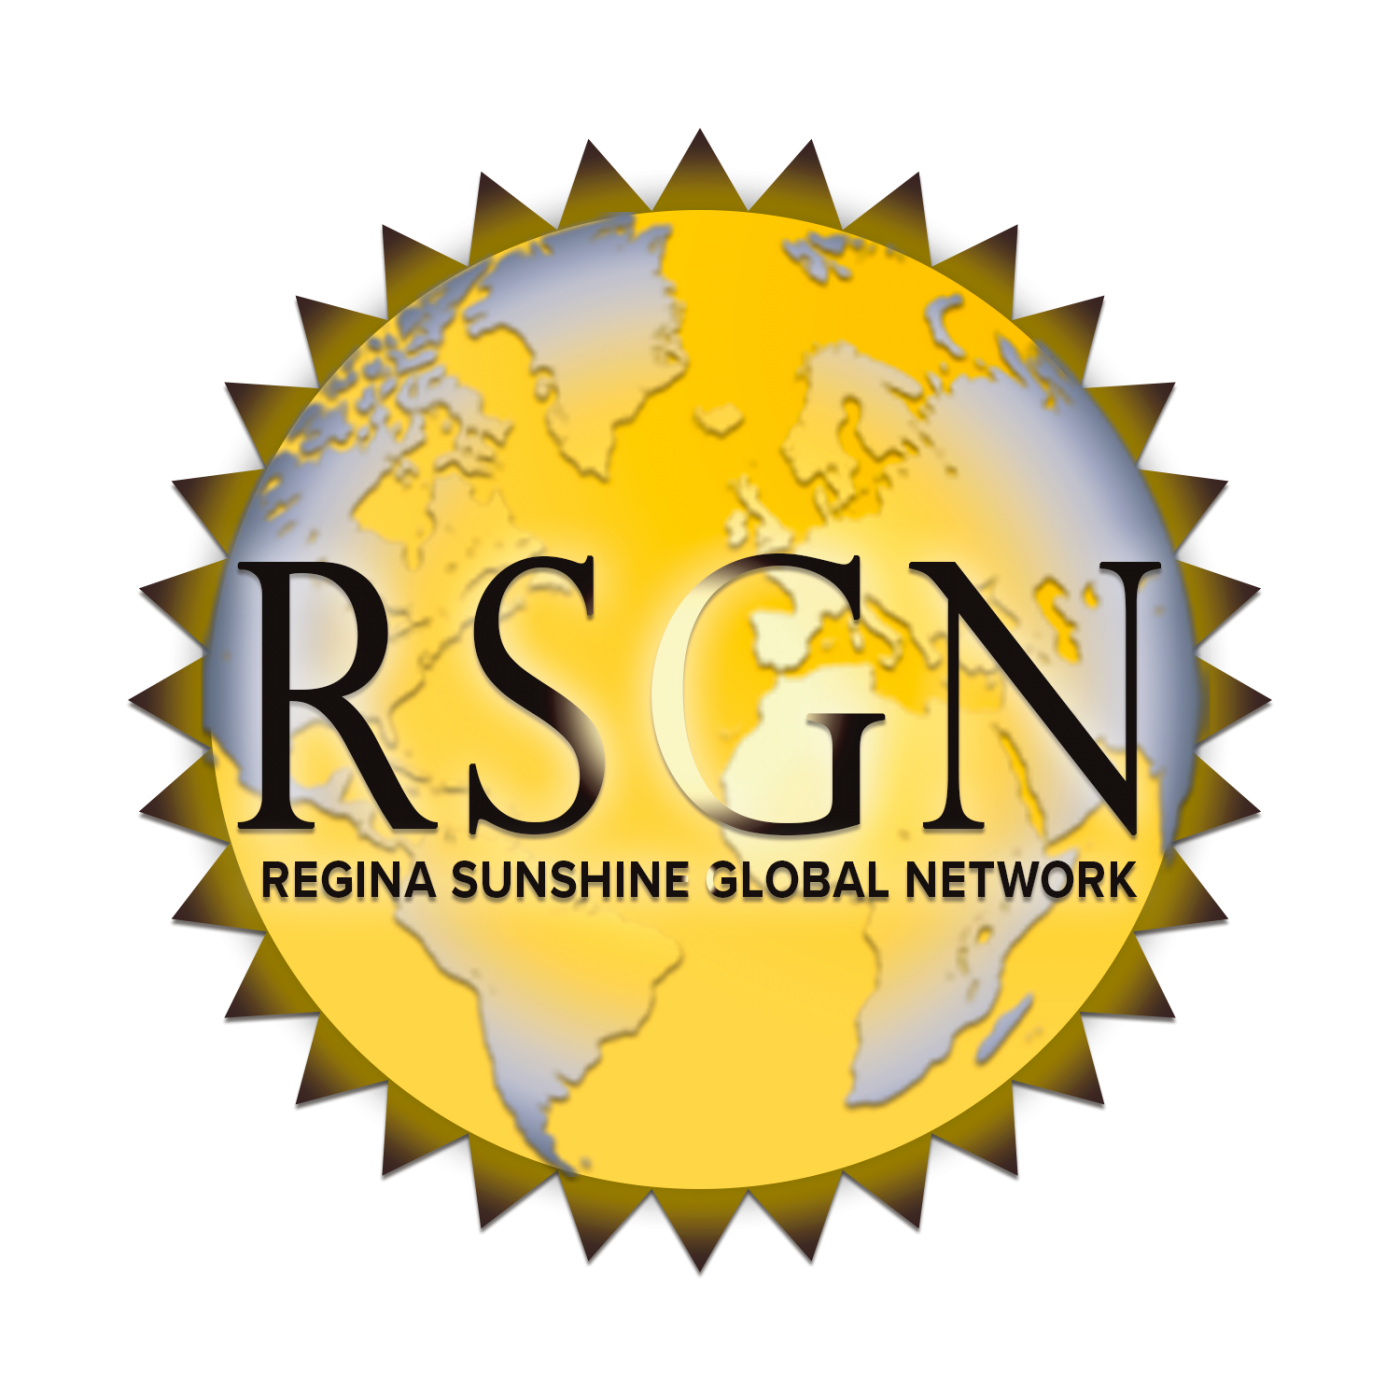 Regina Sunshine